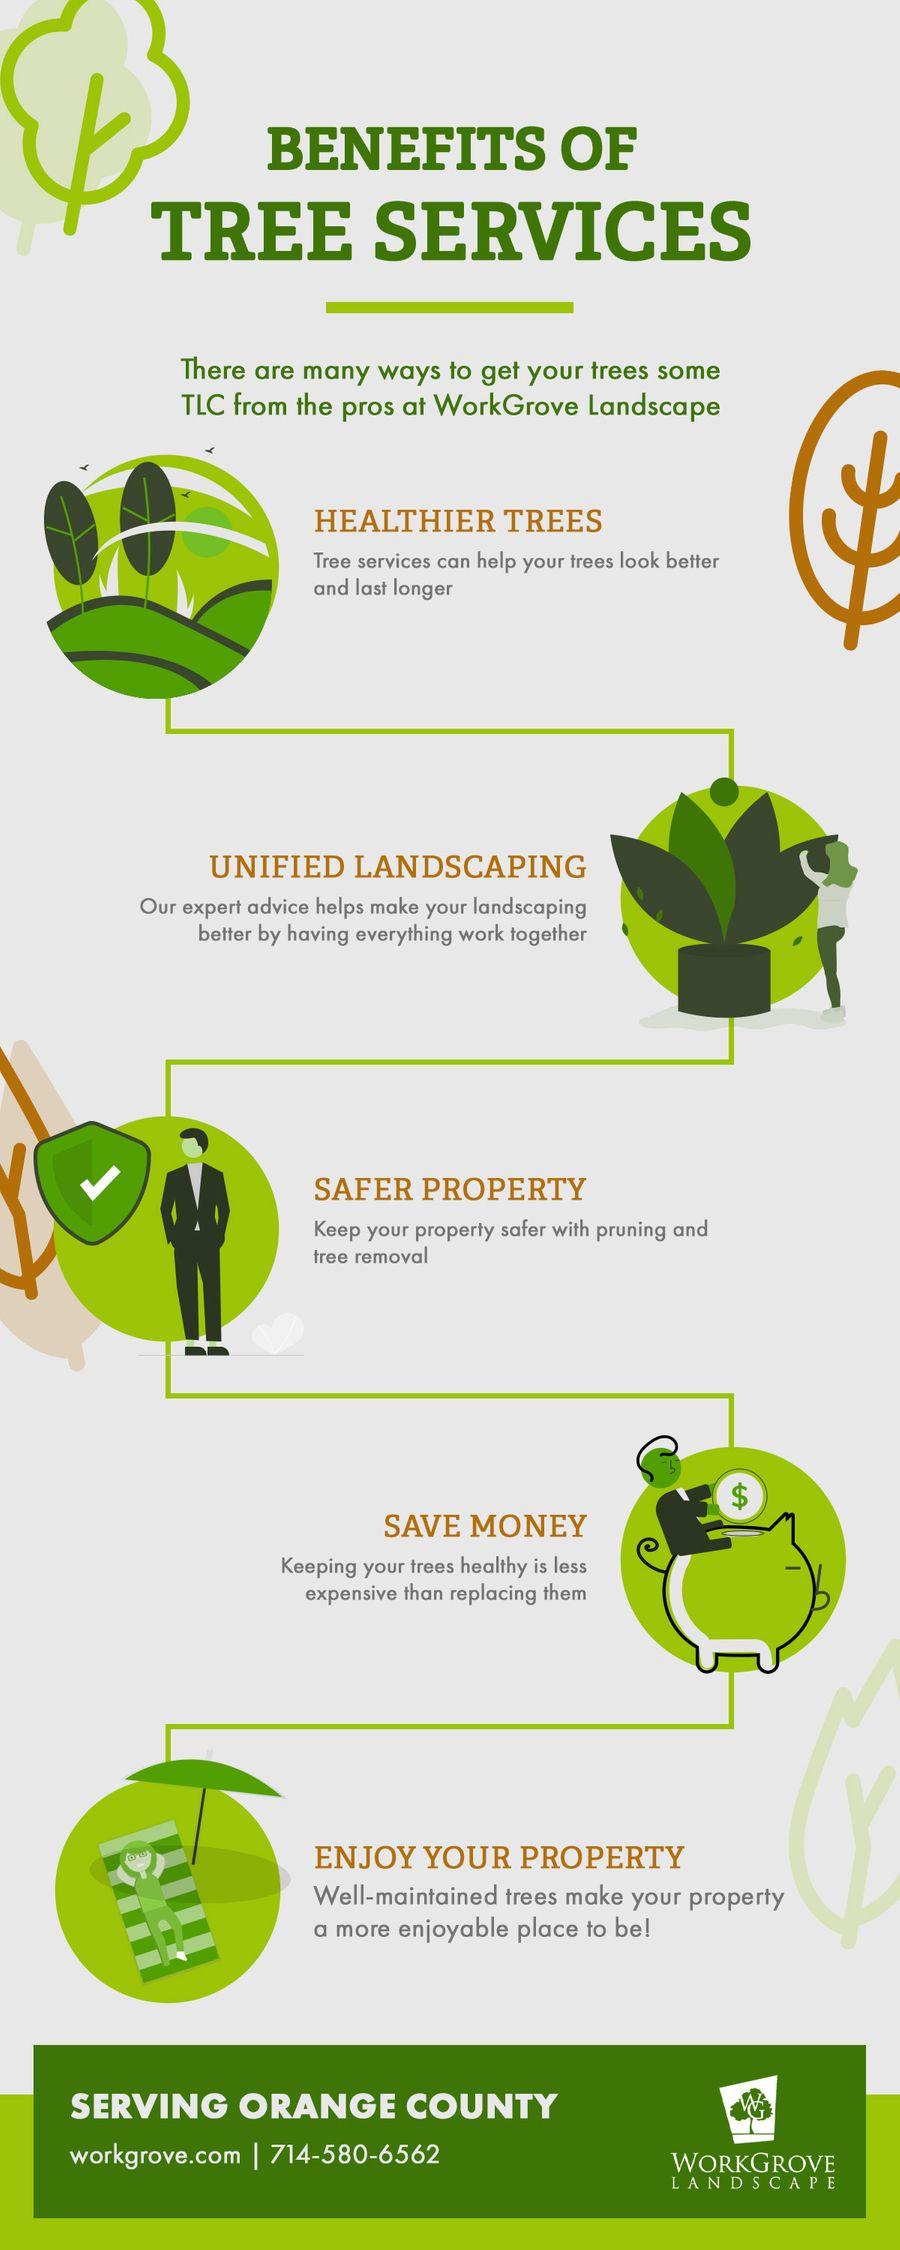 rv-Benefits of Tree Services.jpg